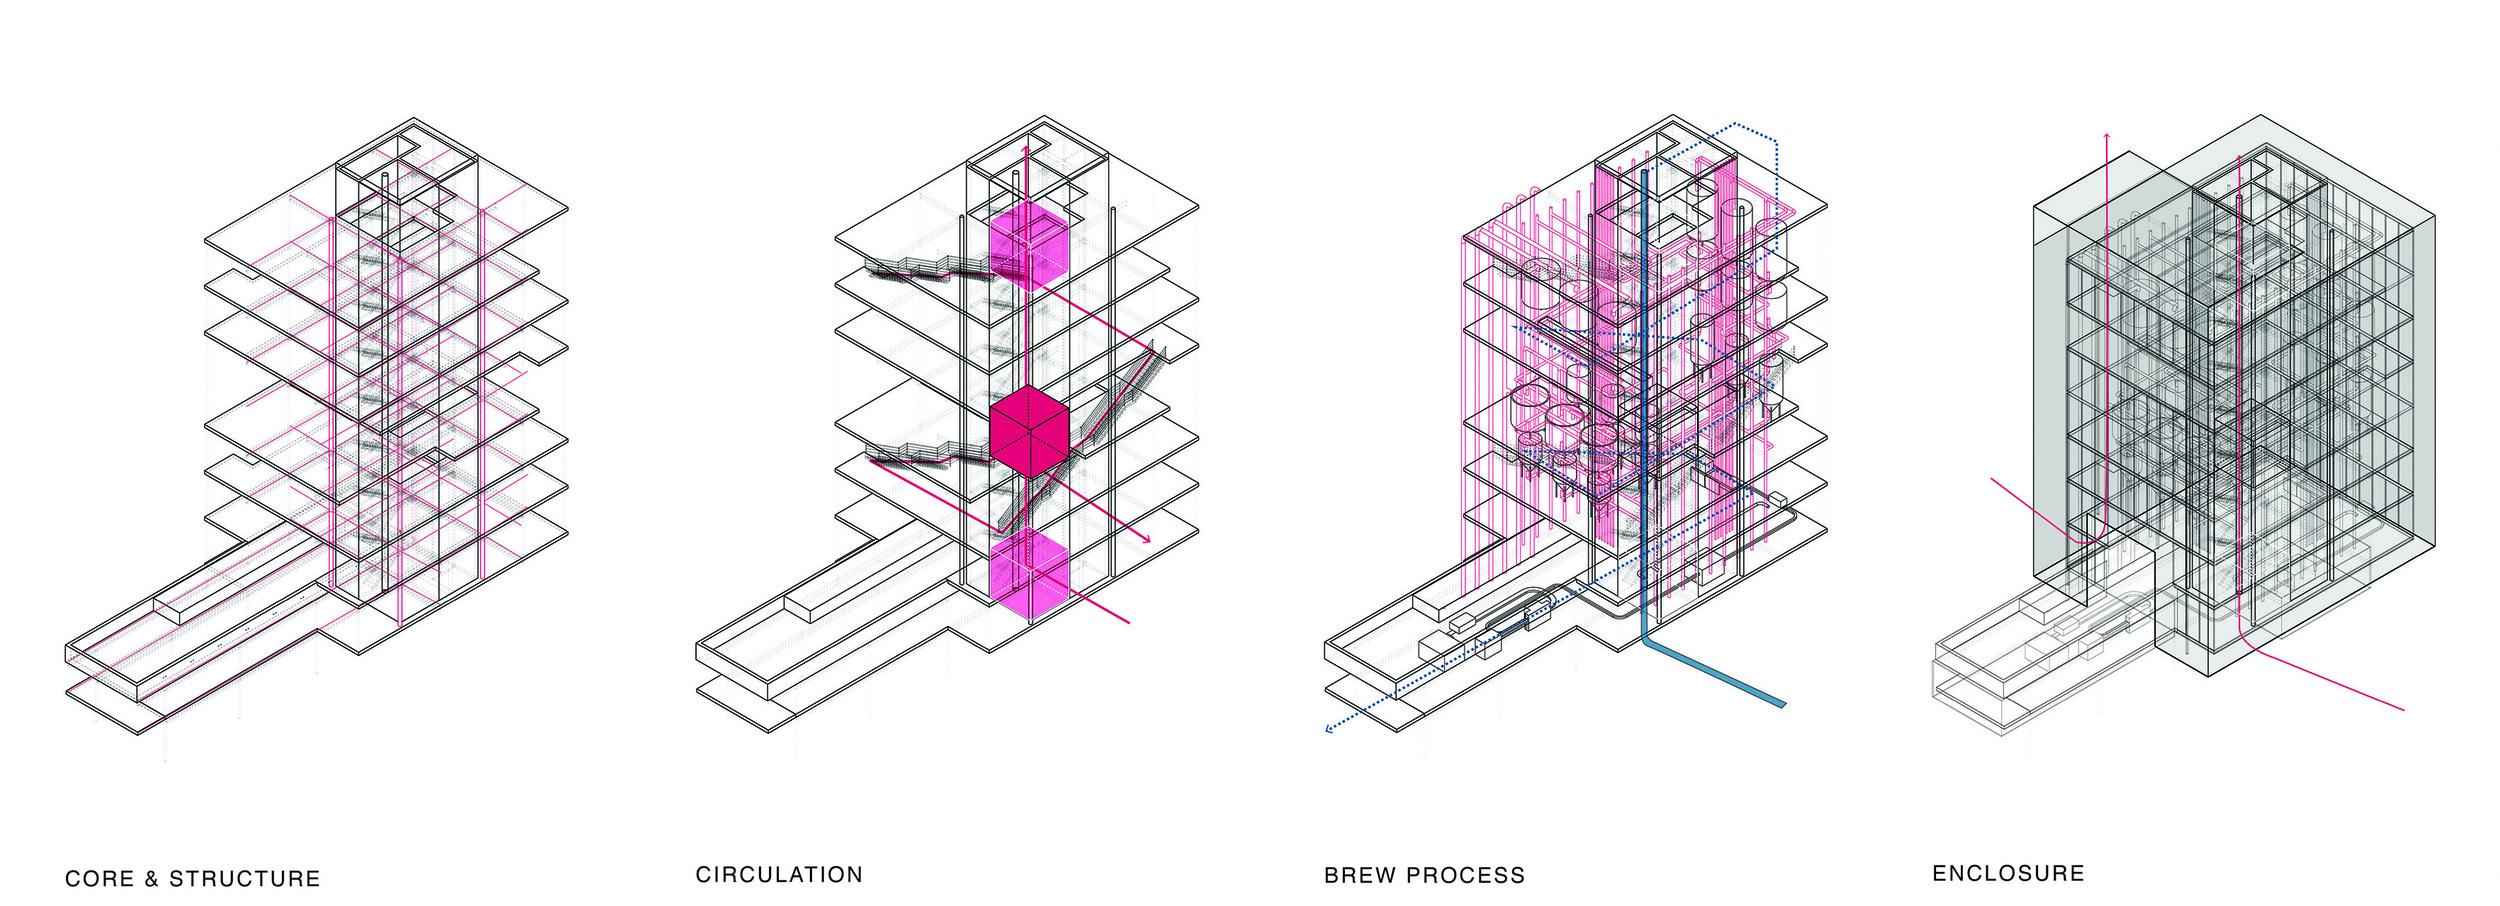 03_Vertical_Brewery_Alejandra_Fernandez_Location_Core_Structure_Circulation_Brew_Process_Enclosure.jpg